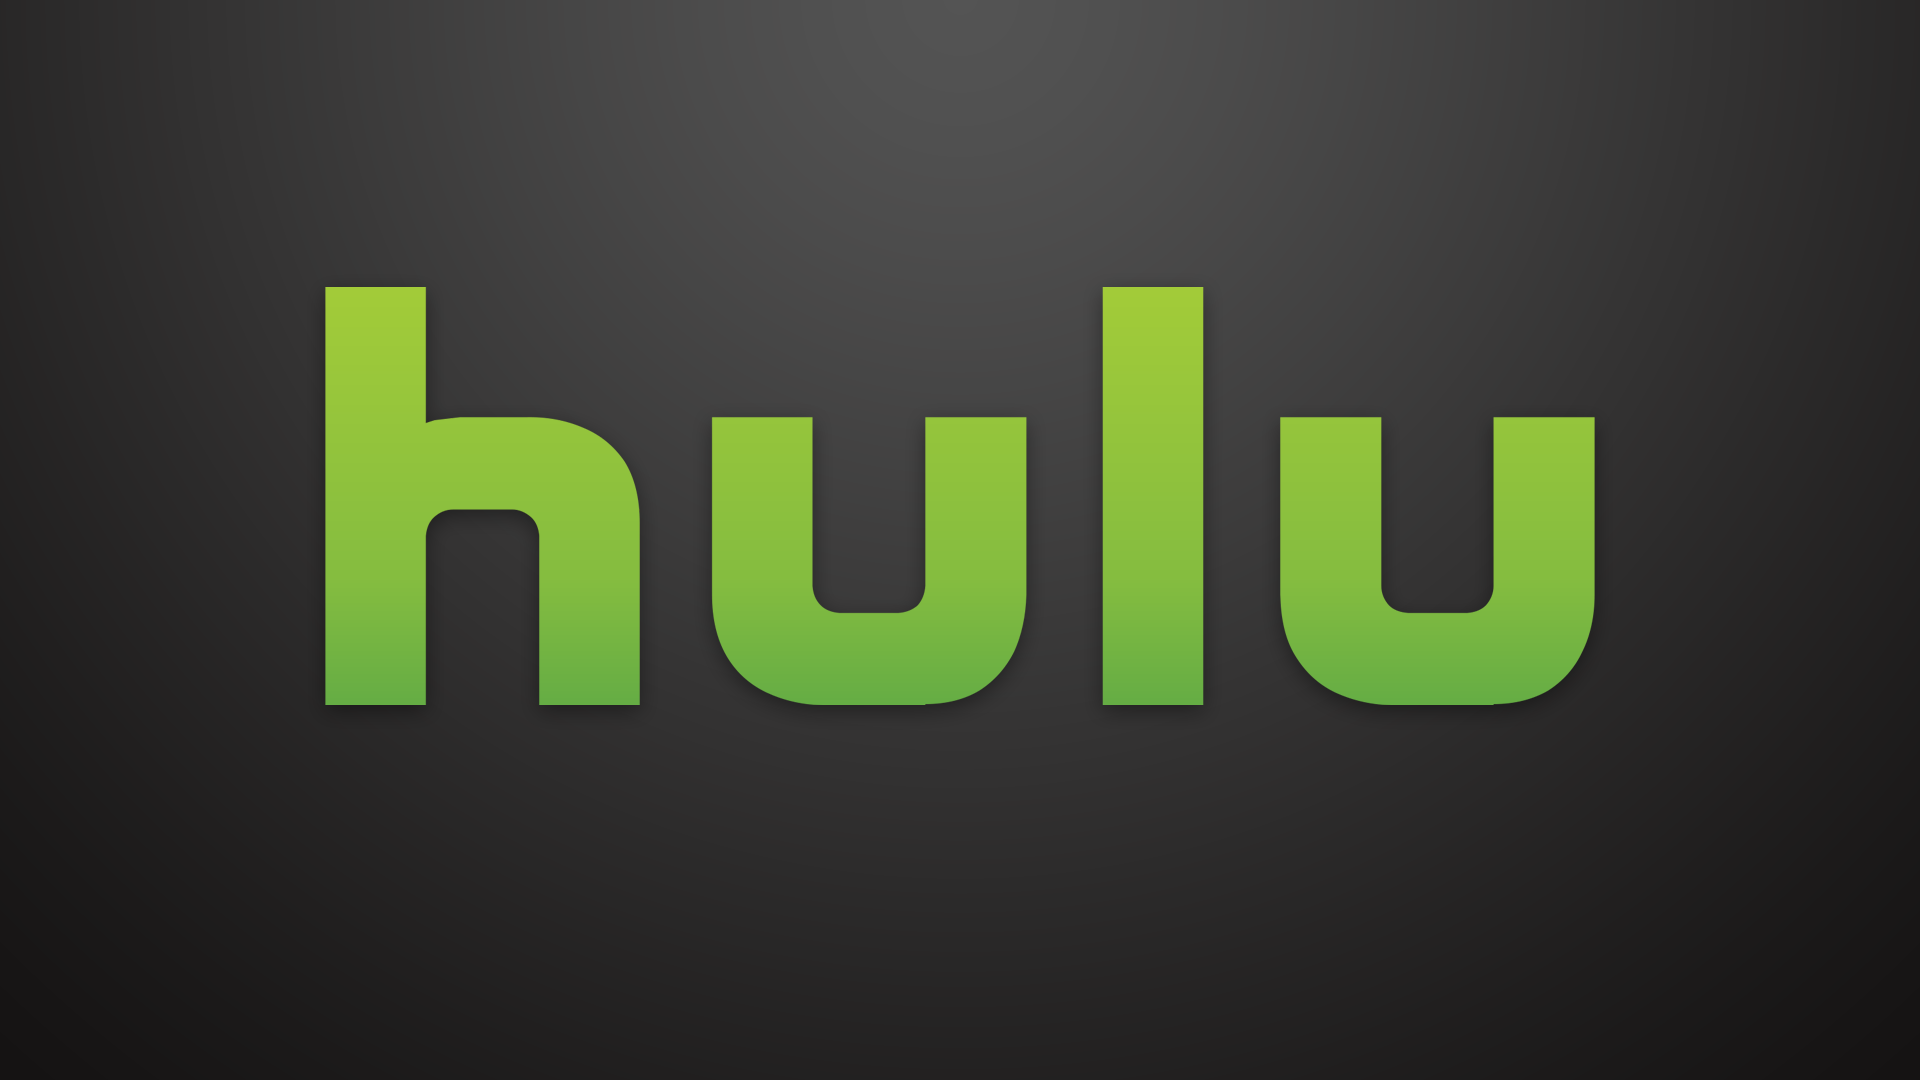 Hulu - Brand + Network Partners